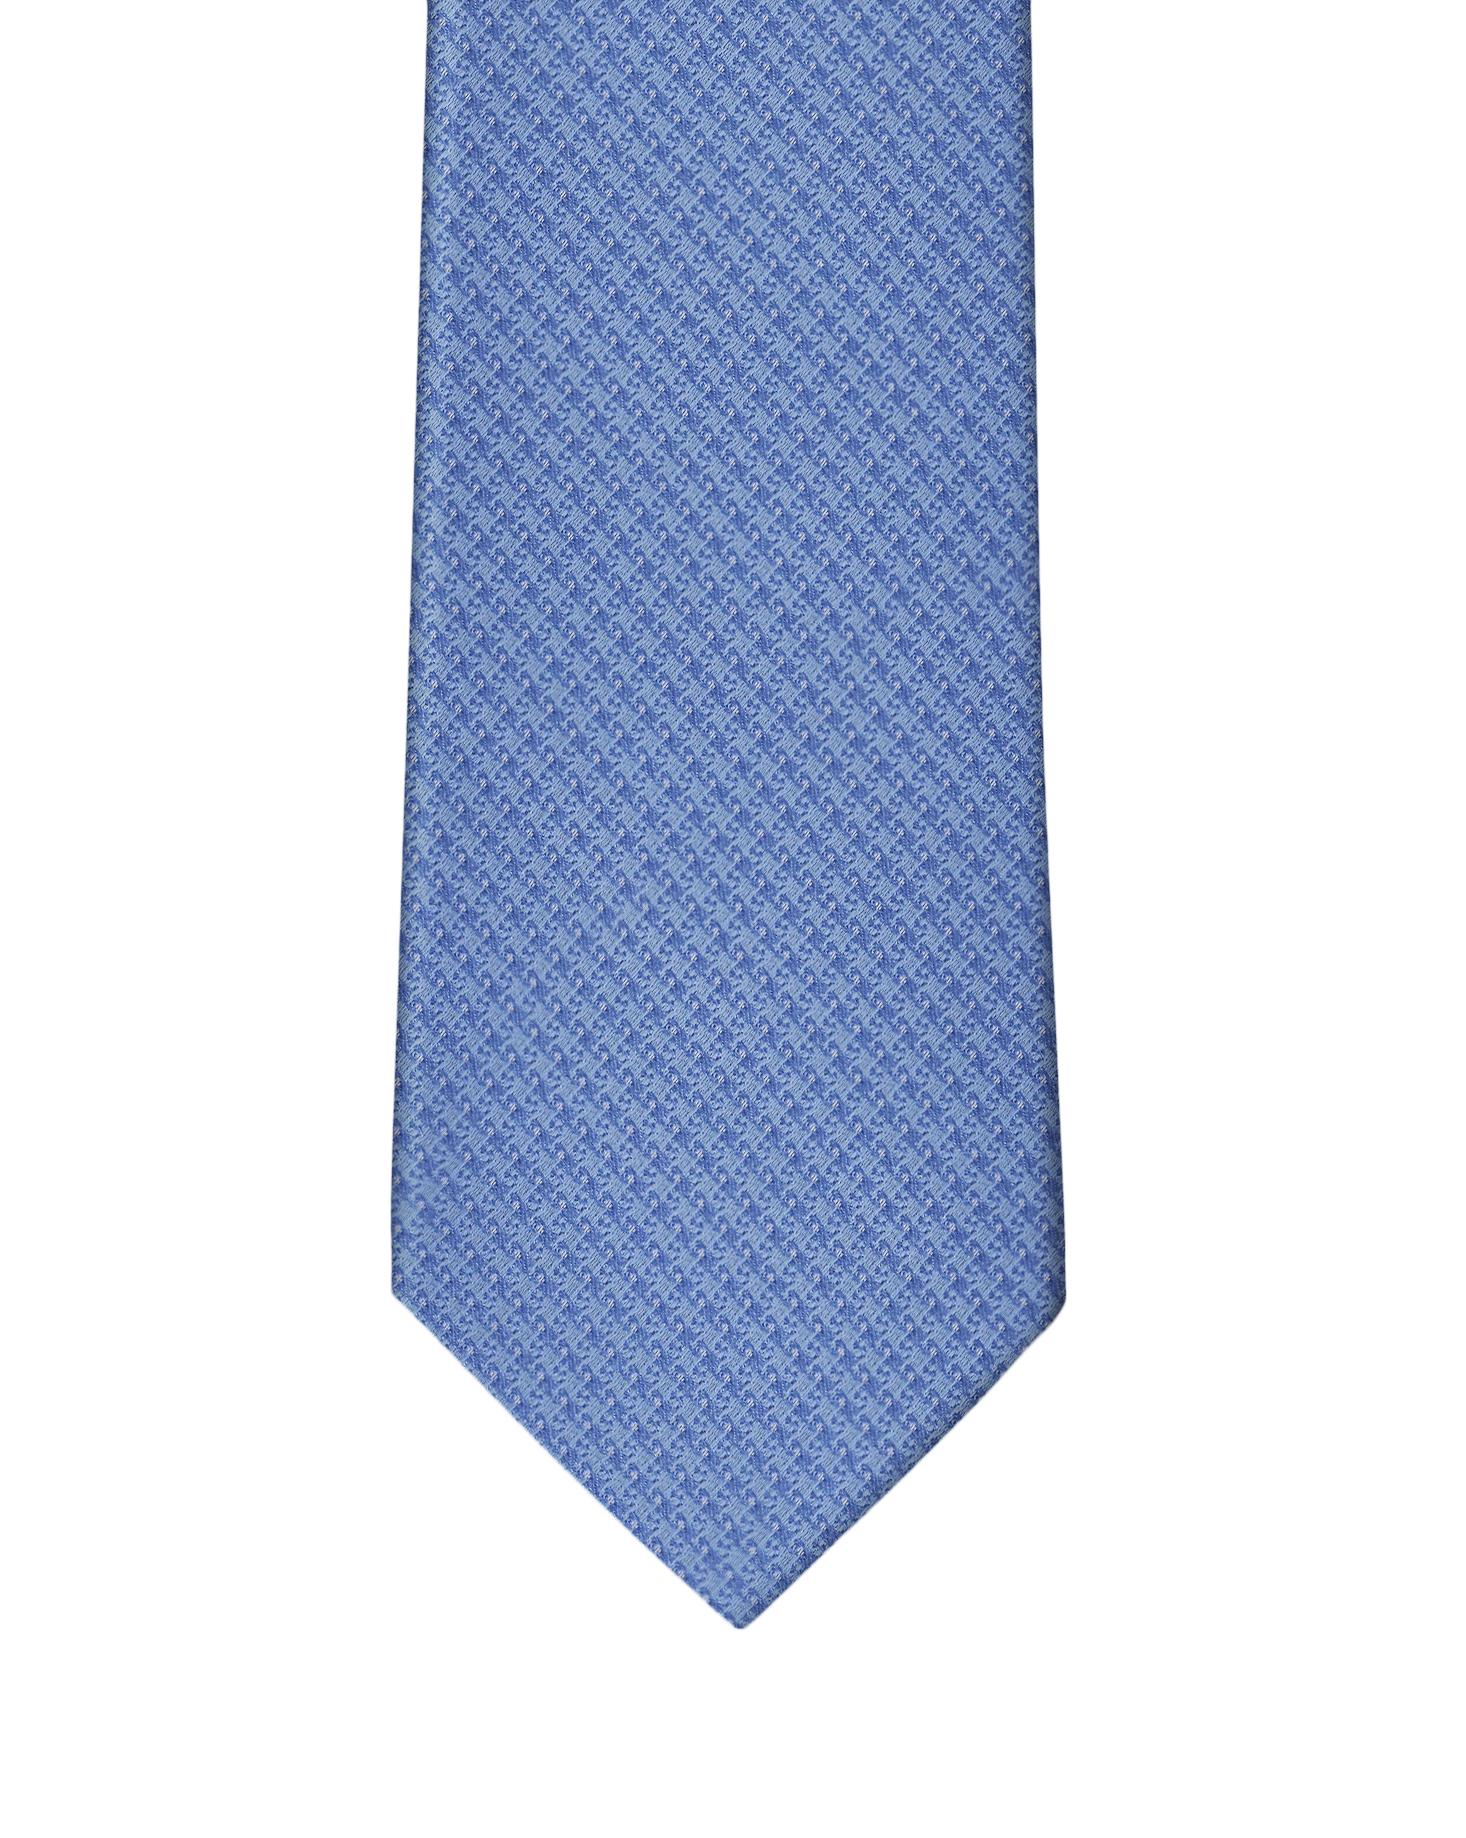 Sky Blue Micro Motif Necktie